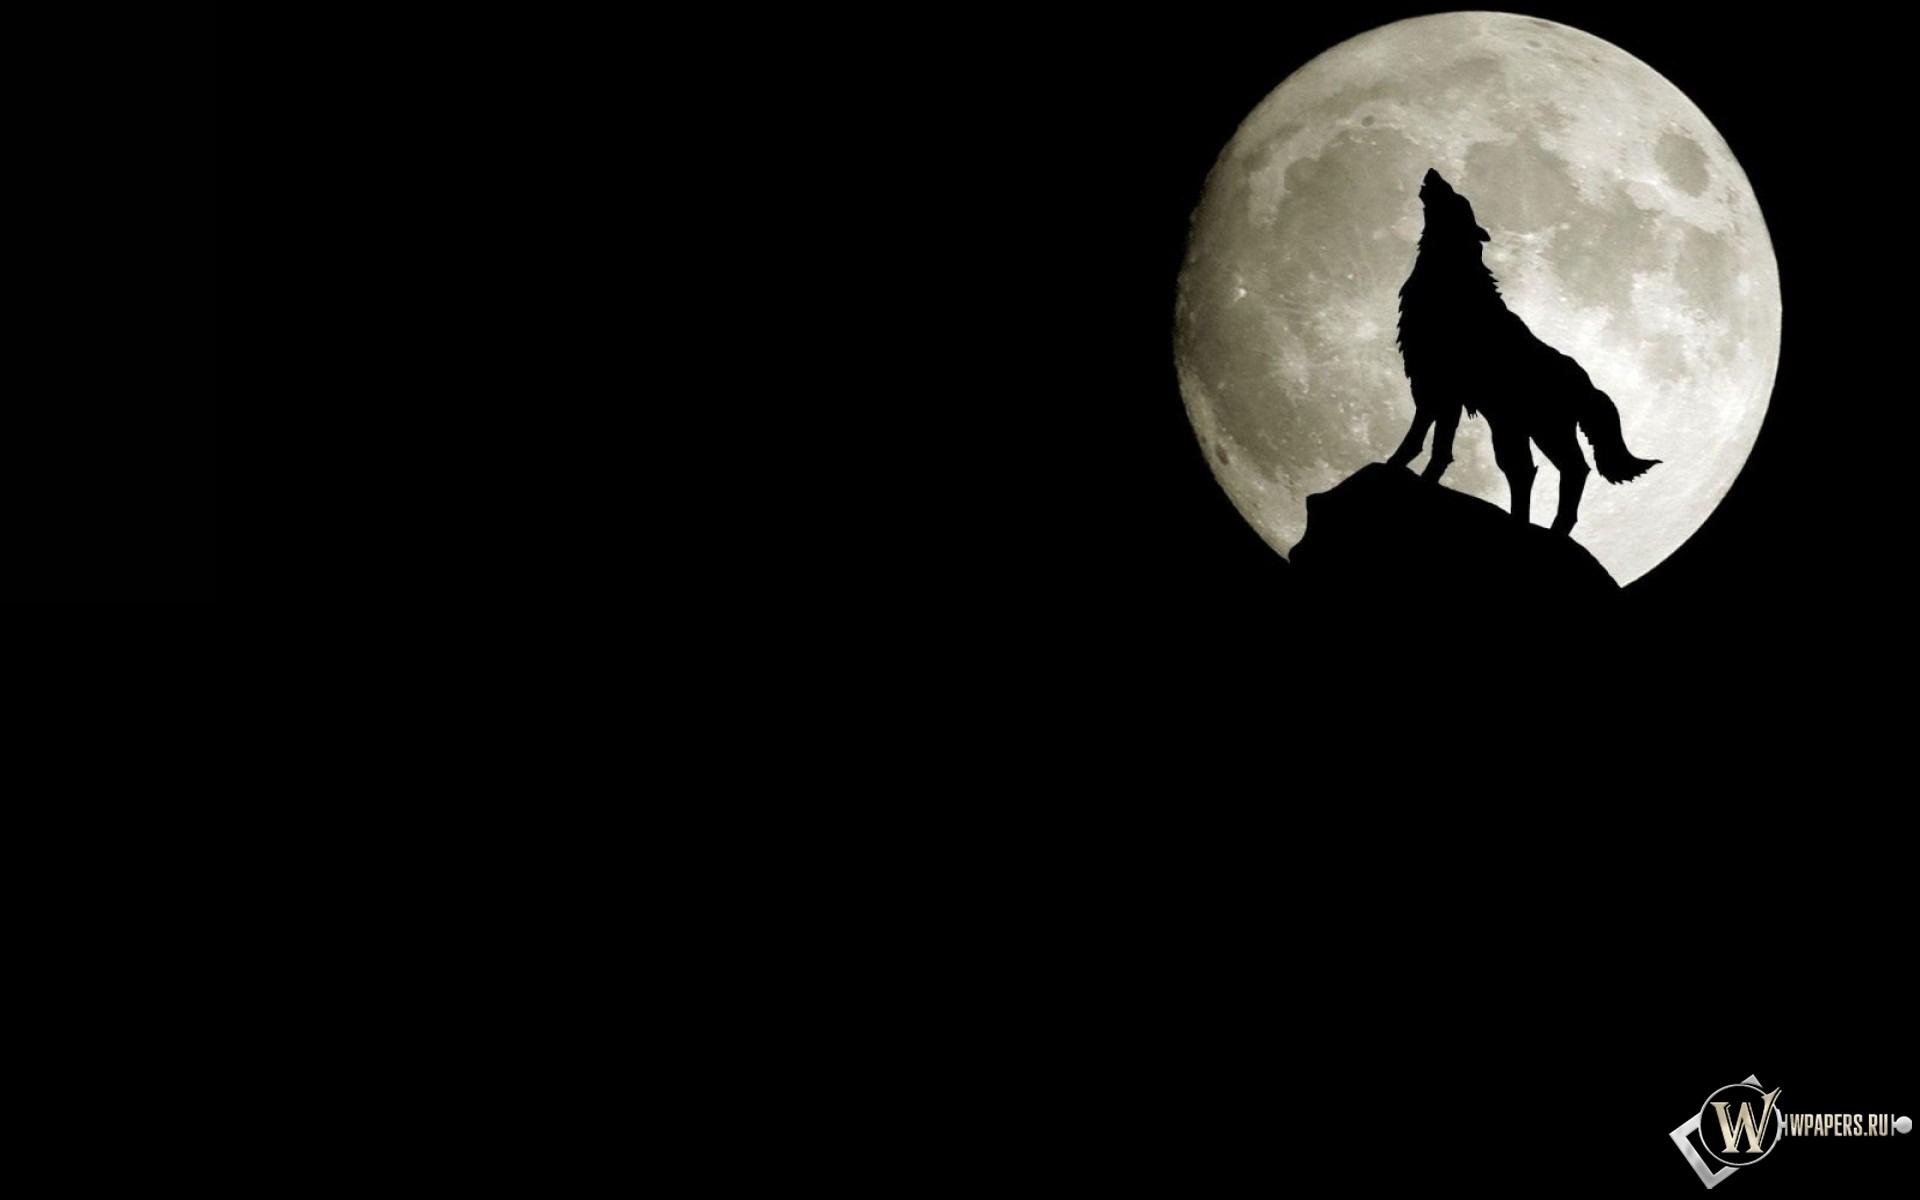 Волк на фоне луны 1920x1200